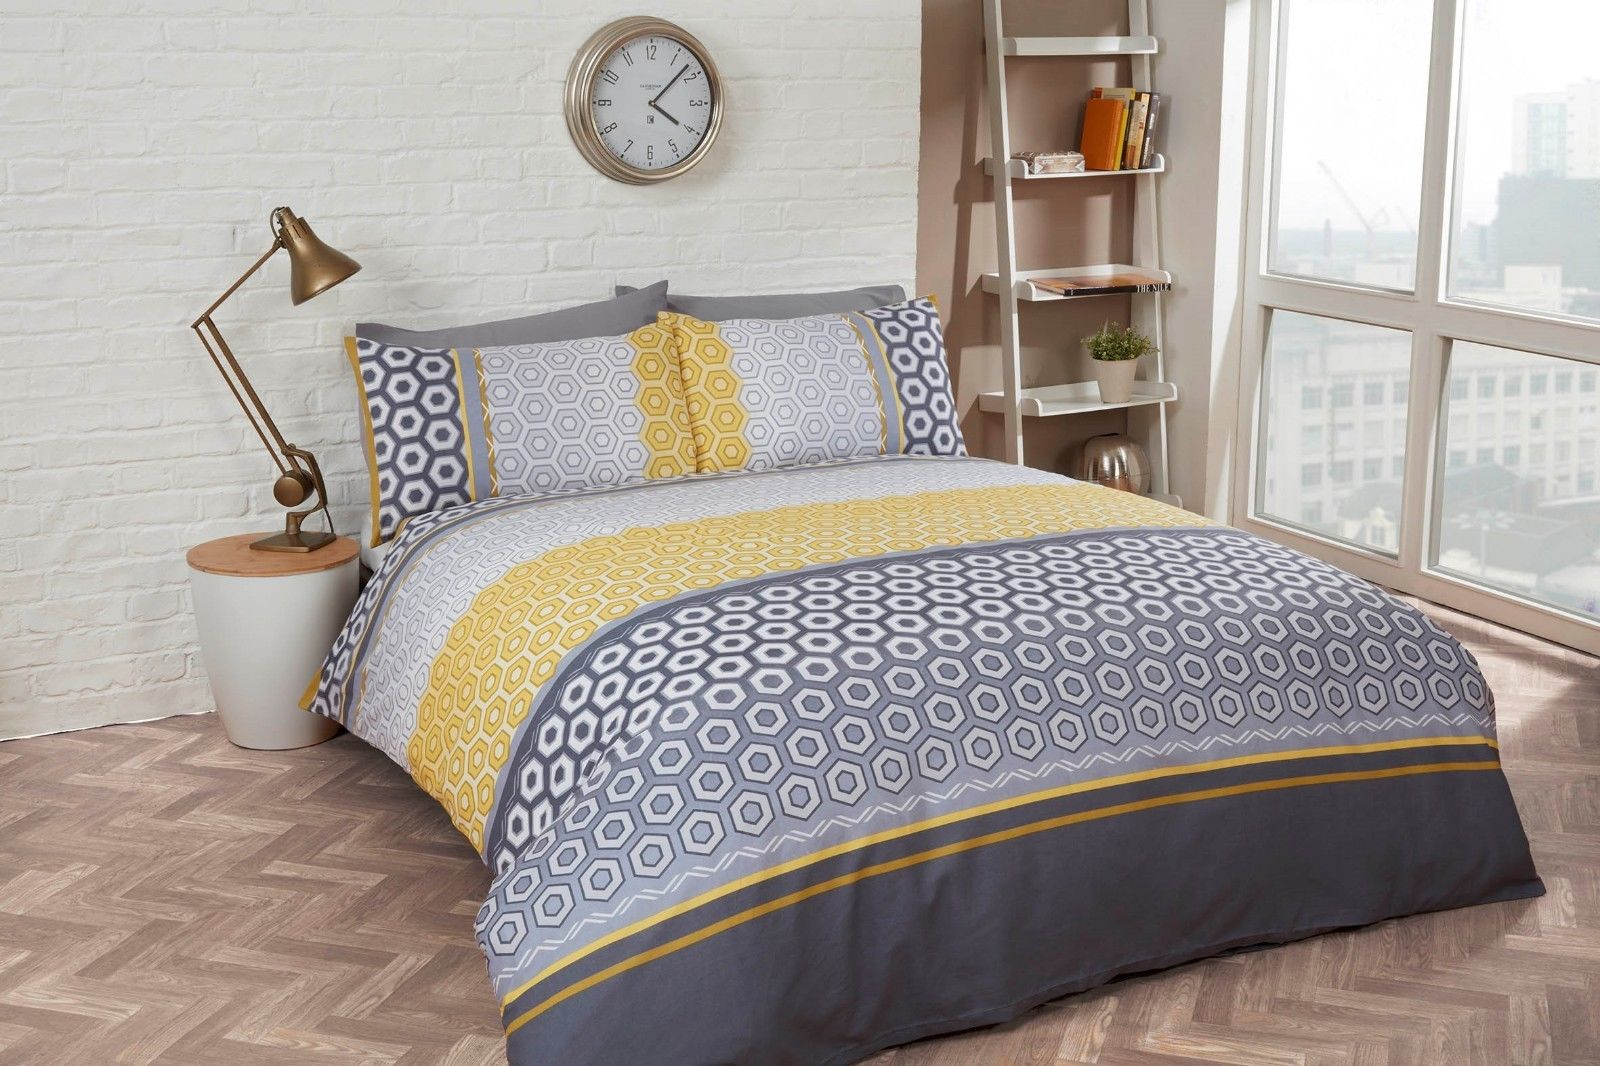 Rapport Barbican Geometric Ochreyellow Grey Duvet Cover Bedding Set